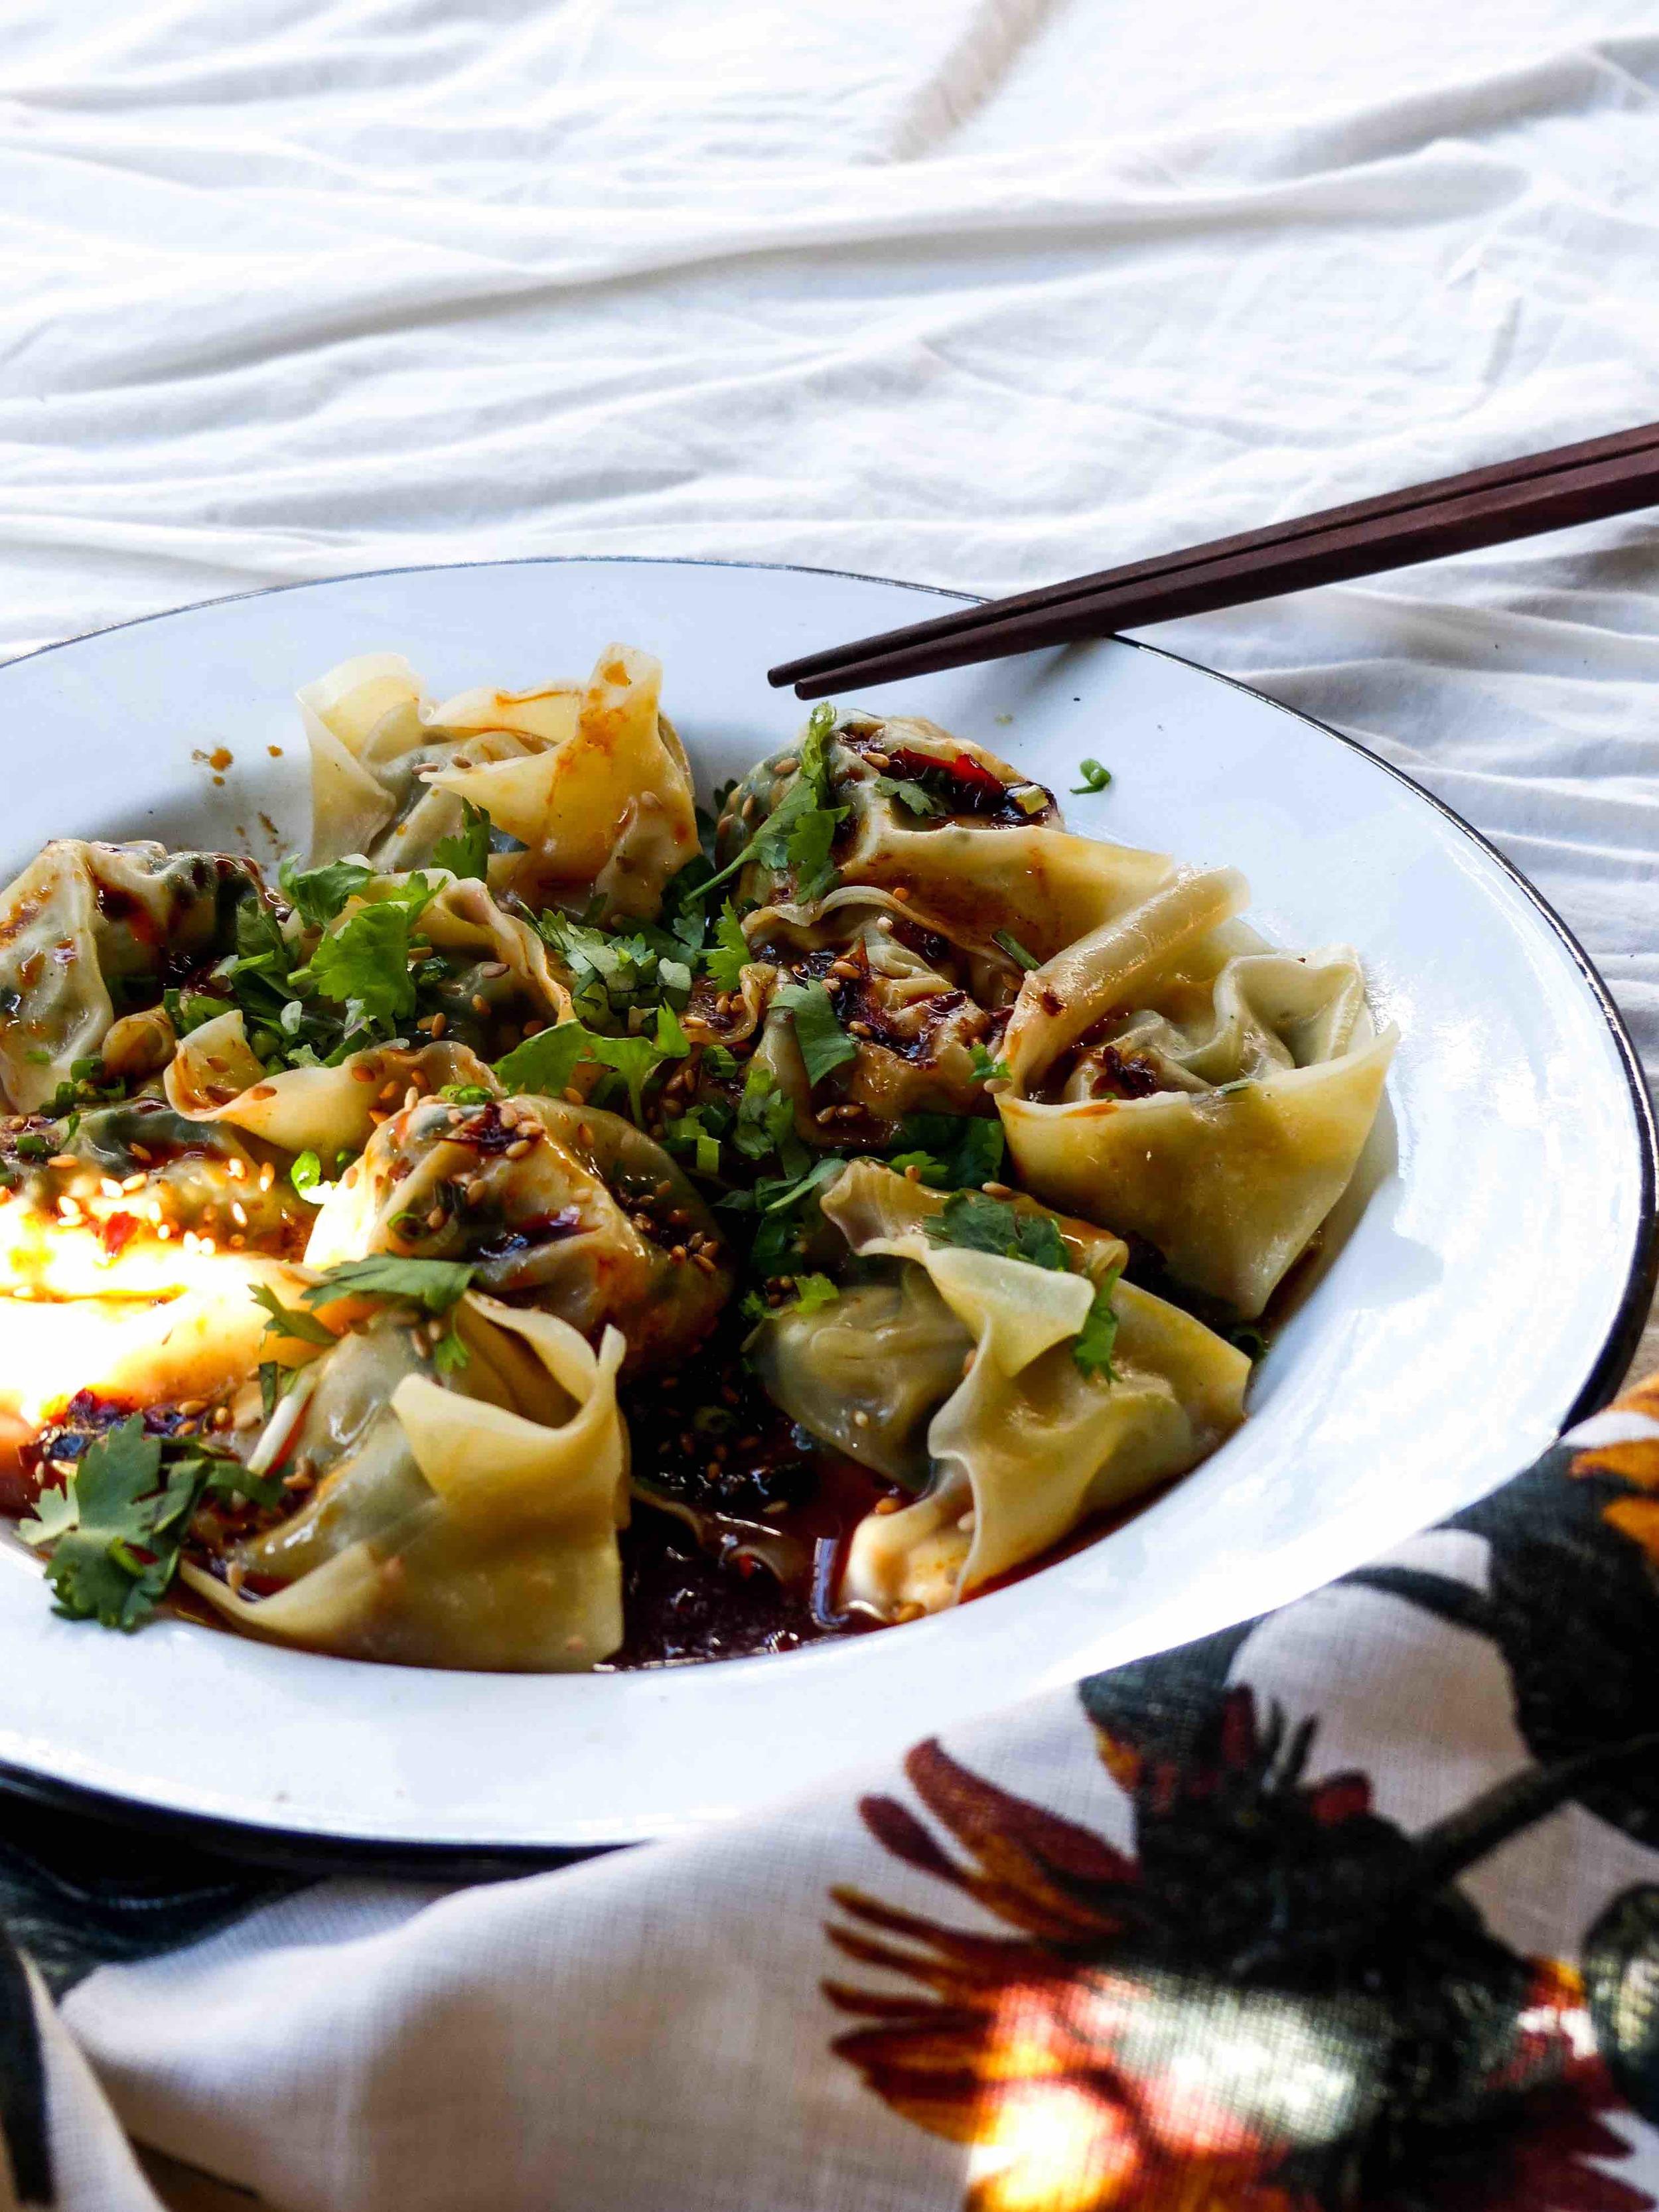 Sichuan-style wontons